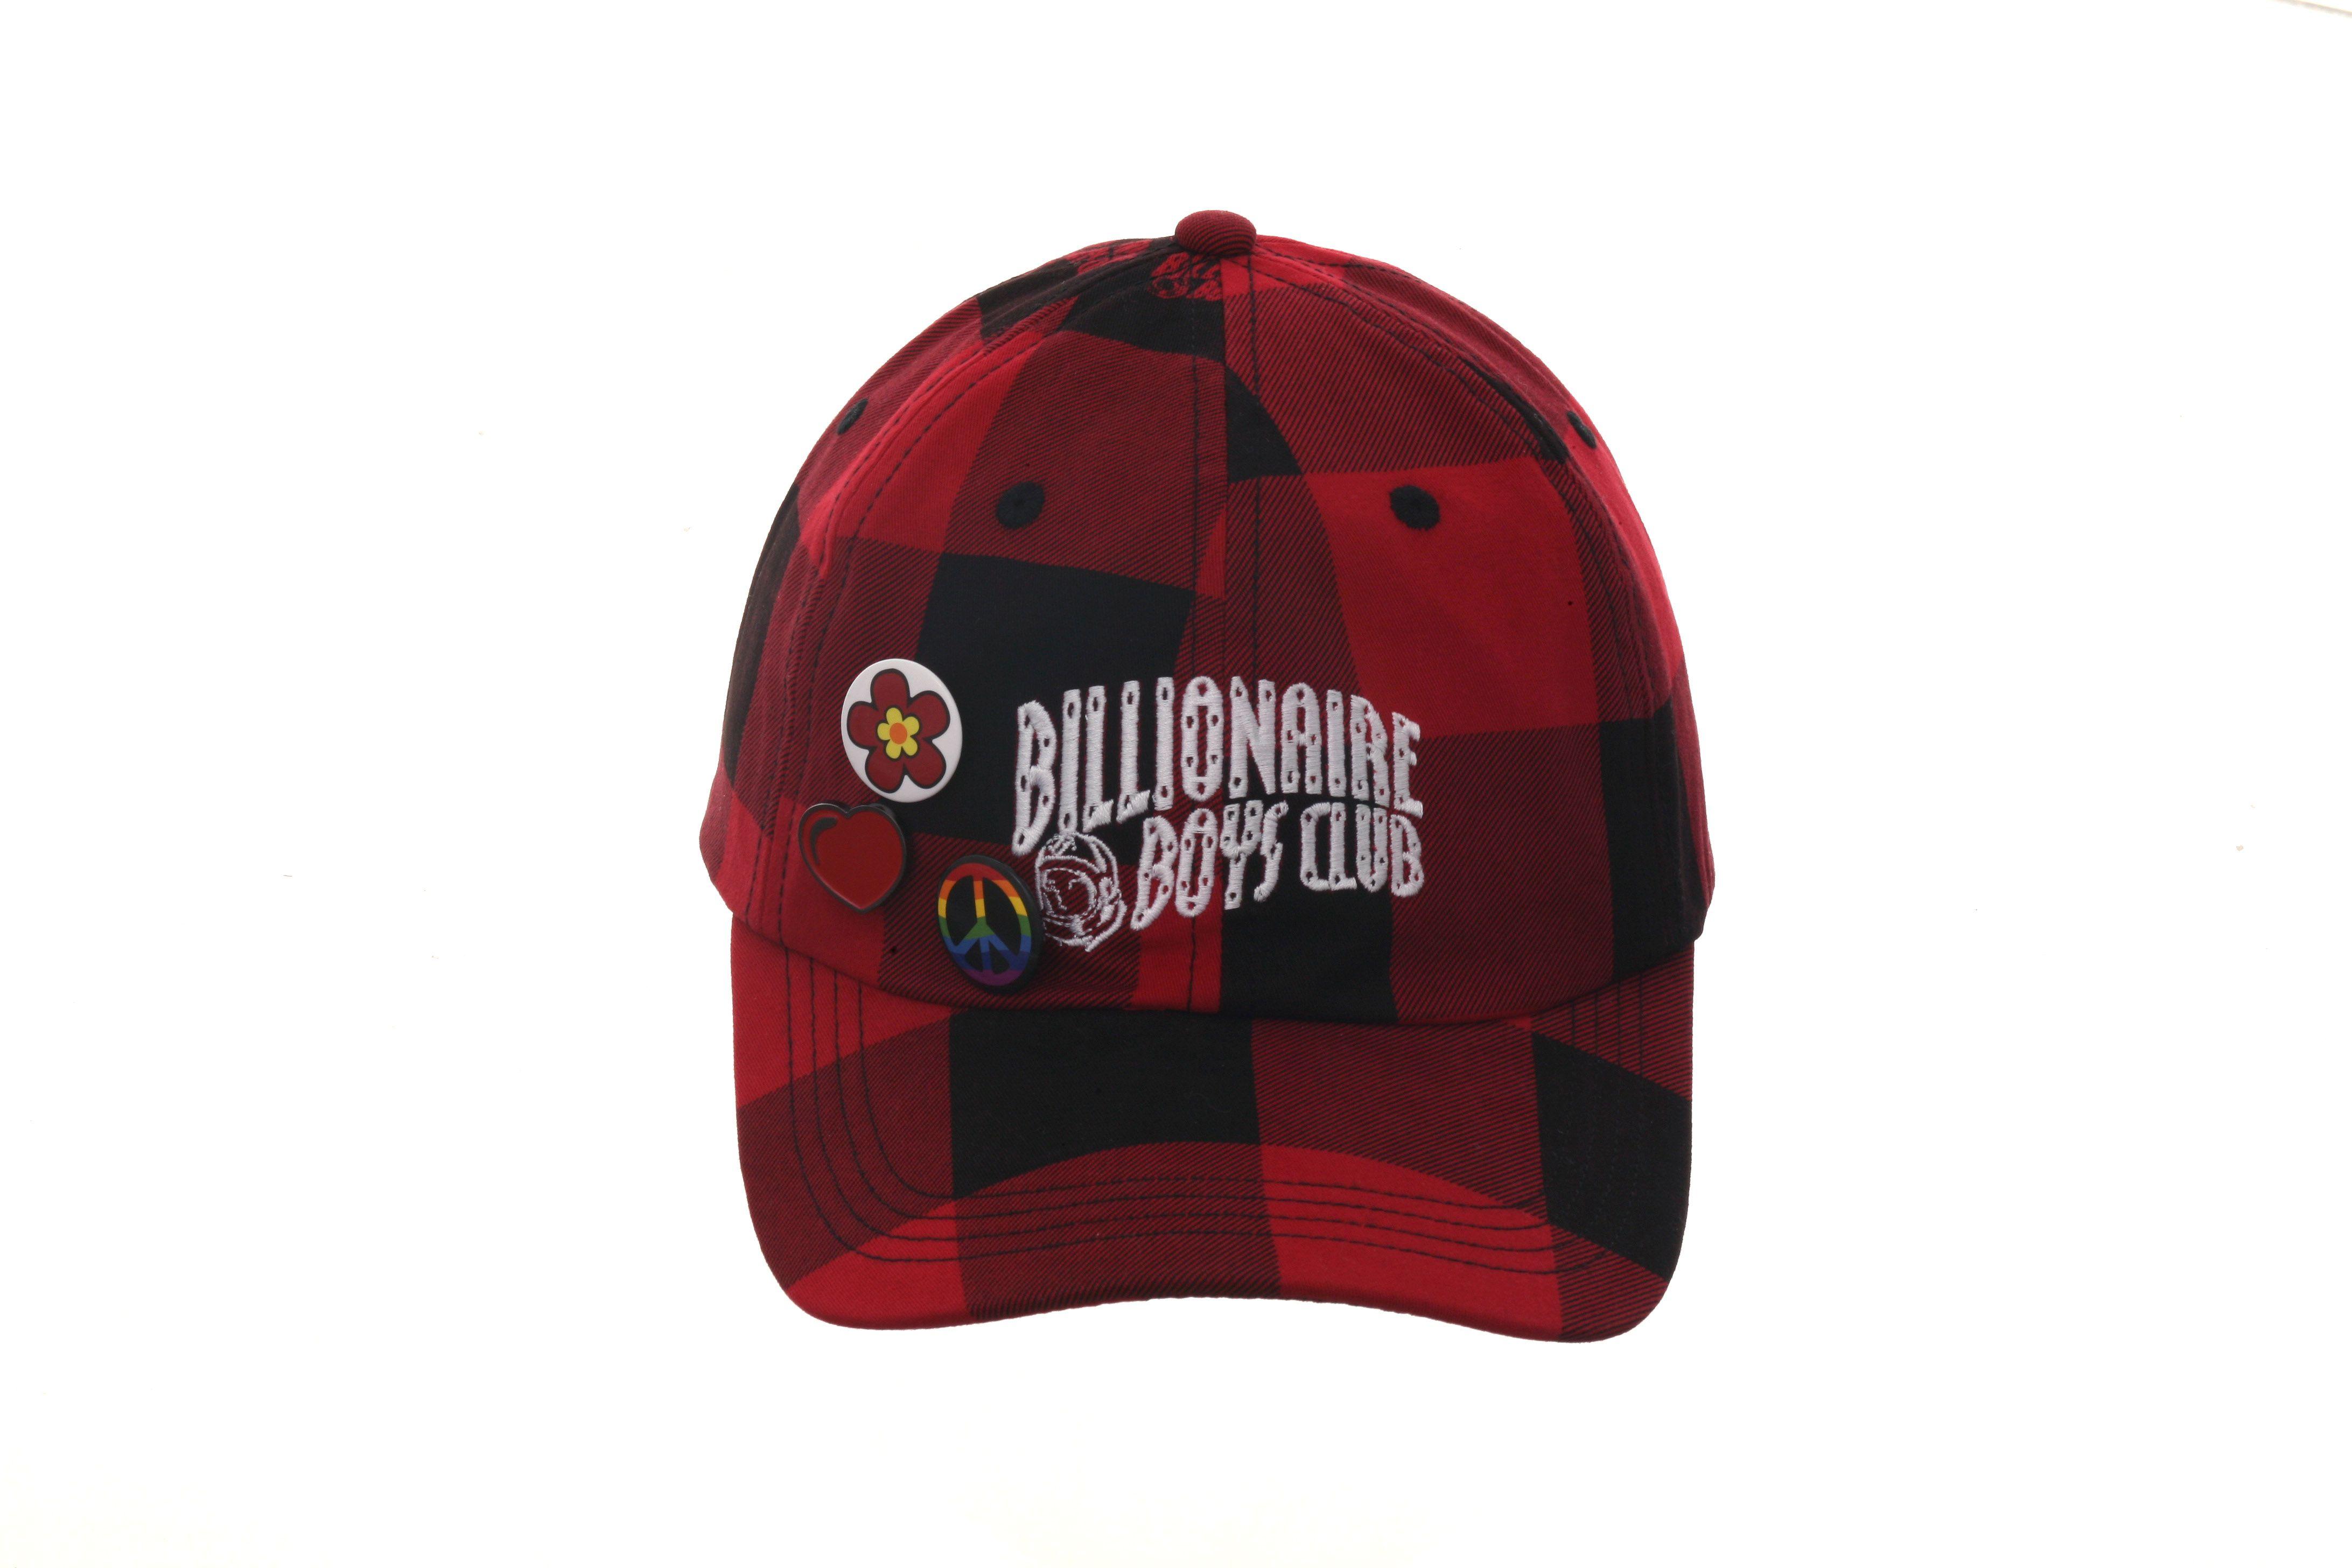 Billionaire Boys Club Checks Adjustable Hat Red Black Adjustable Hat Billionaire Boys Hats